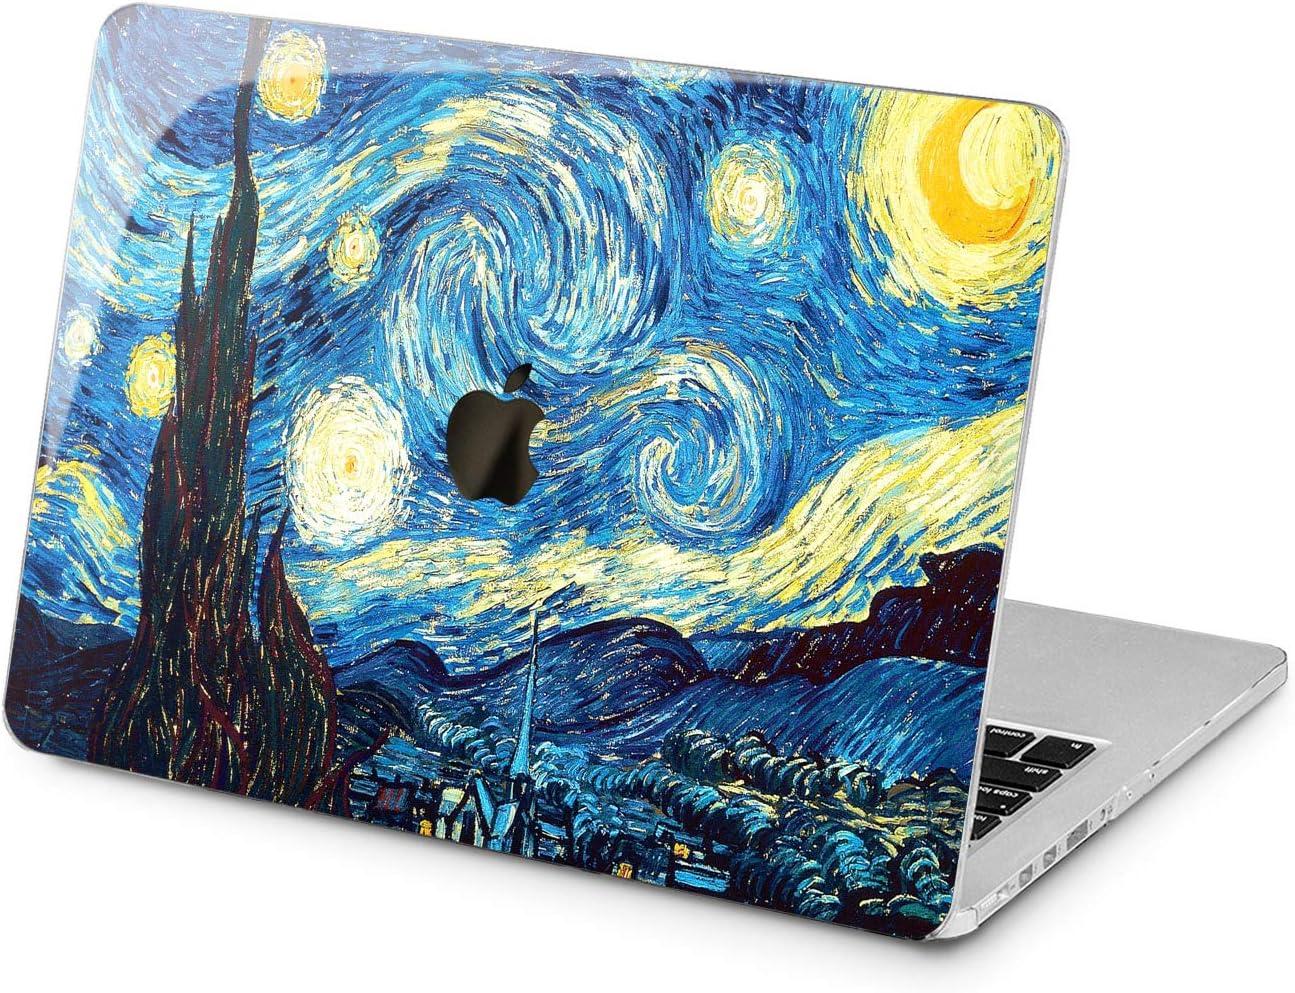 "Cavka Hard Shell Case for Apple MacBook Pro 13"" 2019 15"" 2018 Air 13"" 2020 Retina 2015 Mac 11"" Mac 12"" Artwork Protective Cover Laptop Painting Blue Starry Night Design Glam Print Plastic Van Gogh"